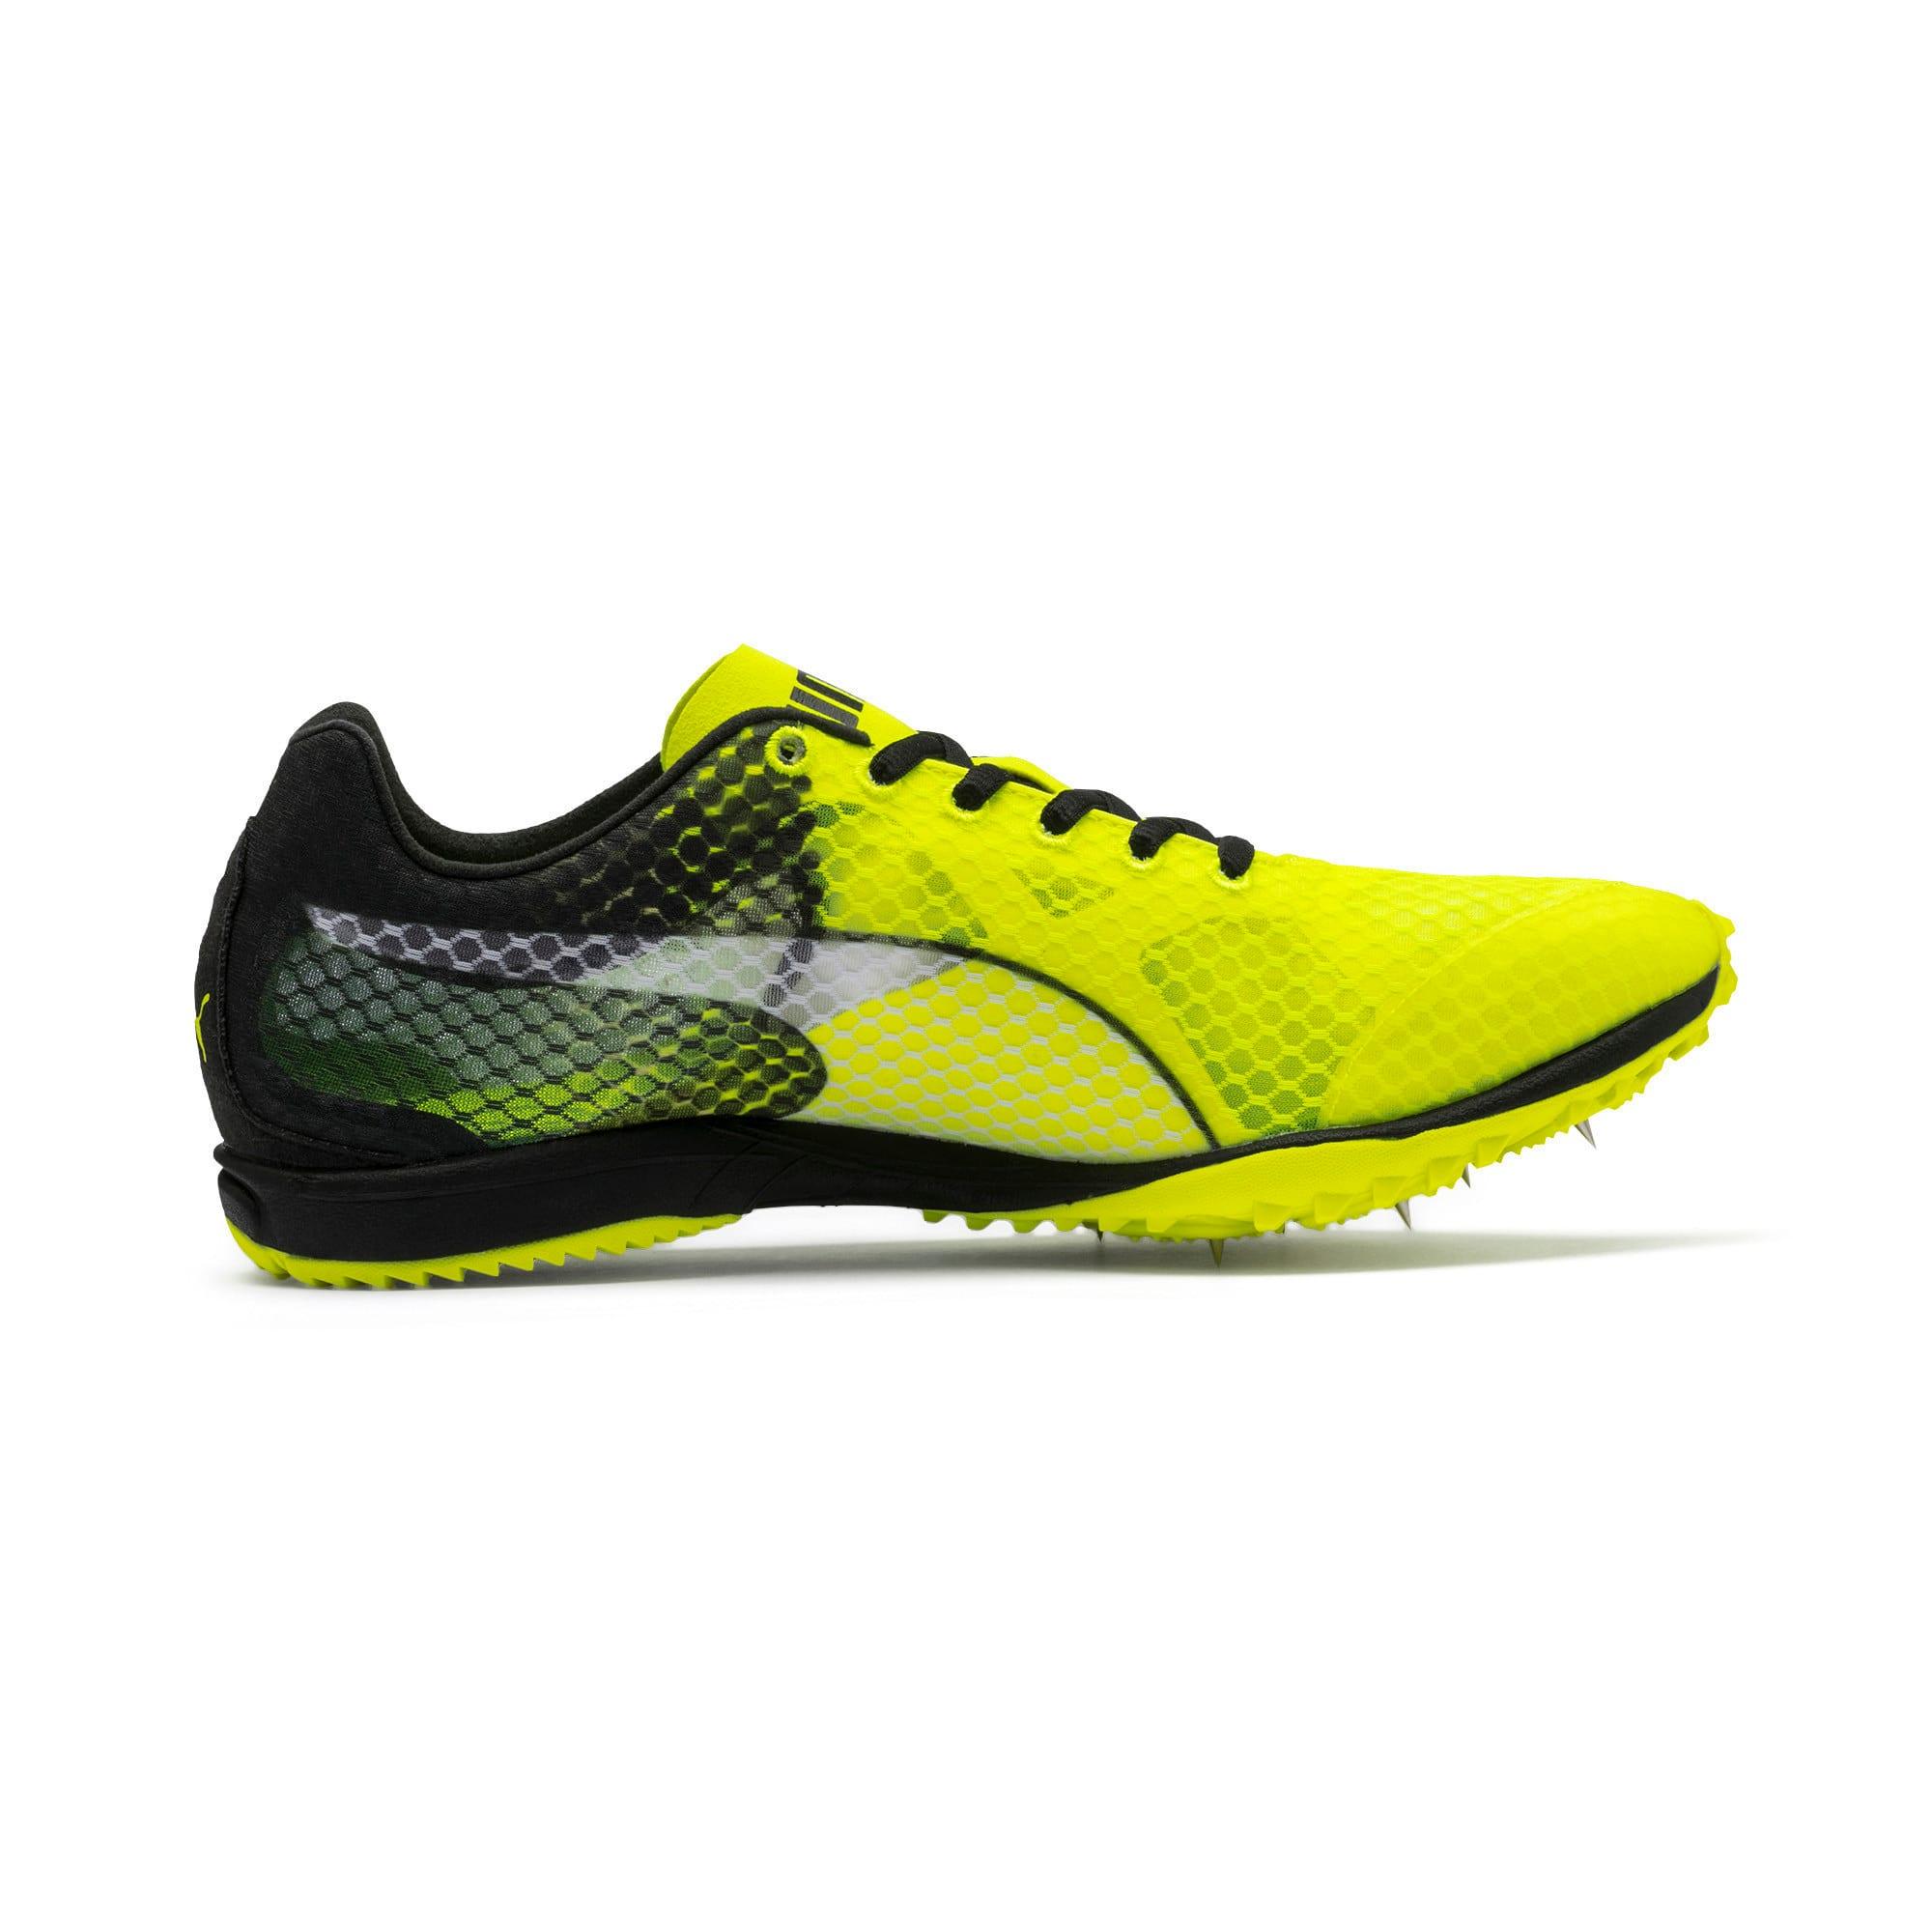 Thumbnail 5 of evoSPEED Haraka 6 Track and Field Boots, Yellow Alert-Black-White, medium-IND